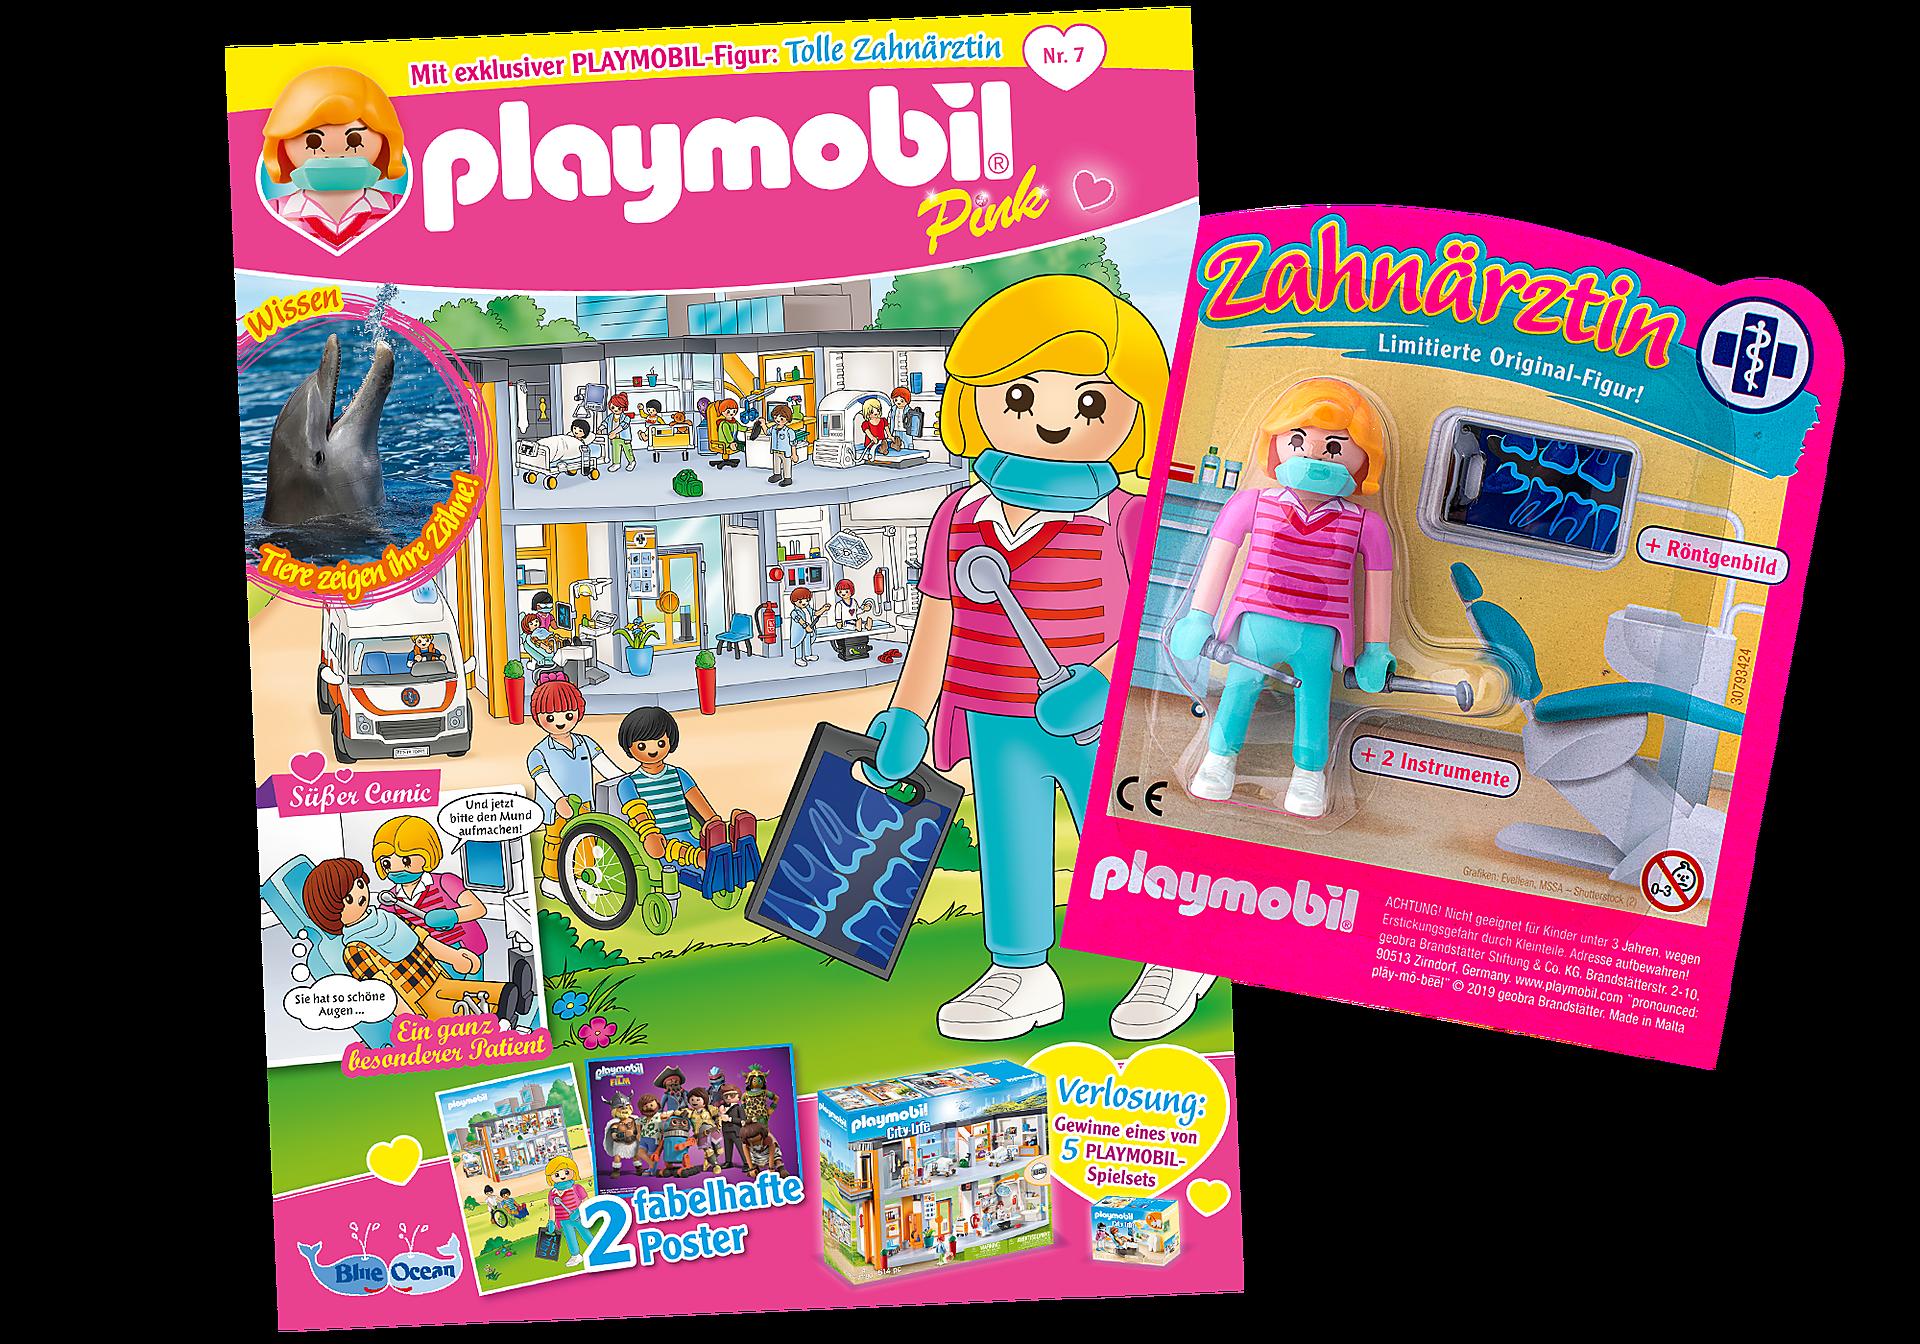 80635 PLAYMOBIL-Magazin Pink 7/2019 (Heft 47) zoom image1